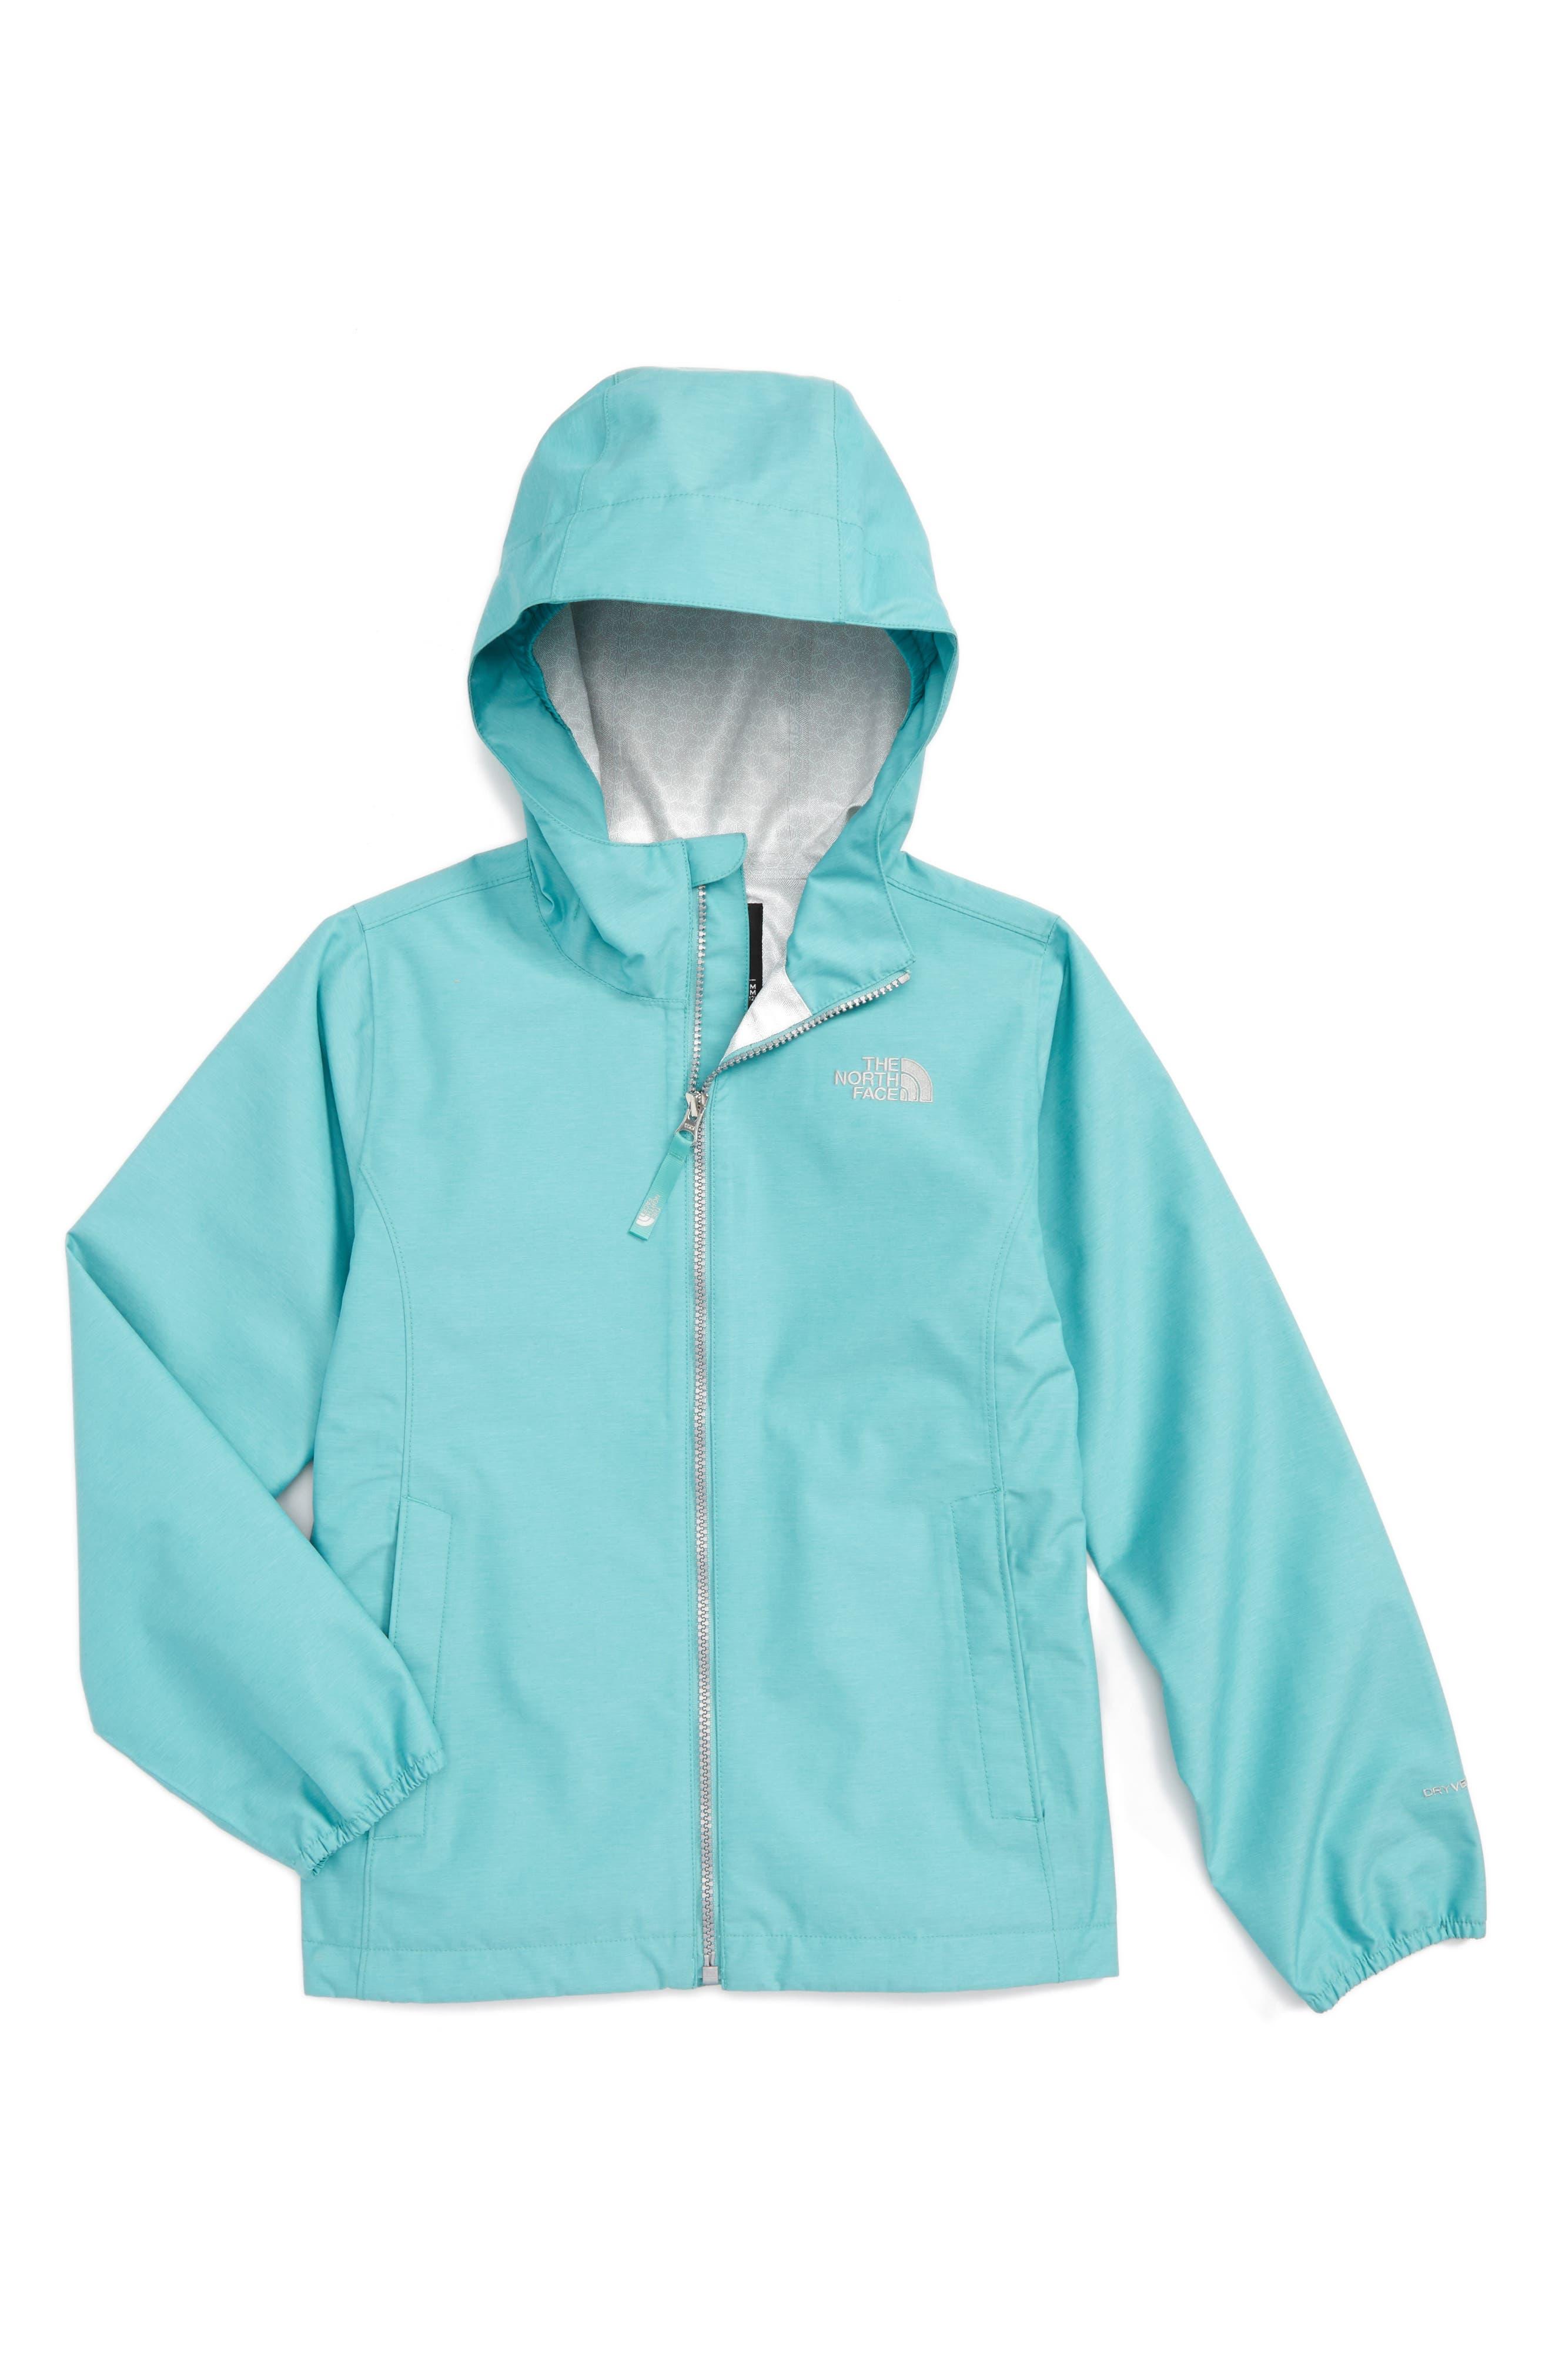 Main Image - The North Face Magnolia Waterproof HyVent® Rain Jacket (Big Girls)